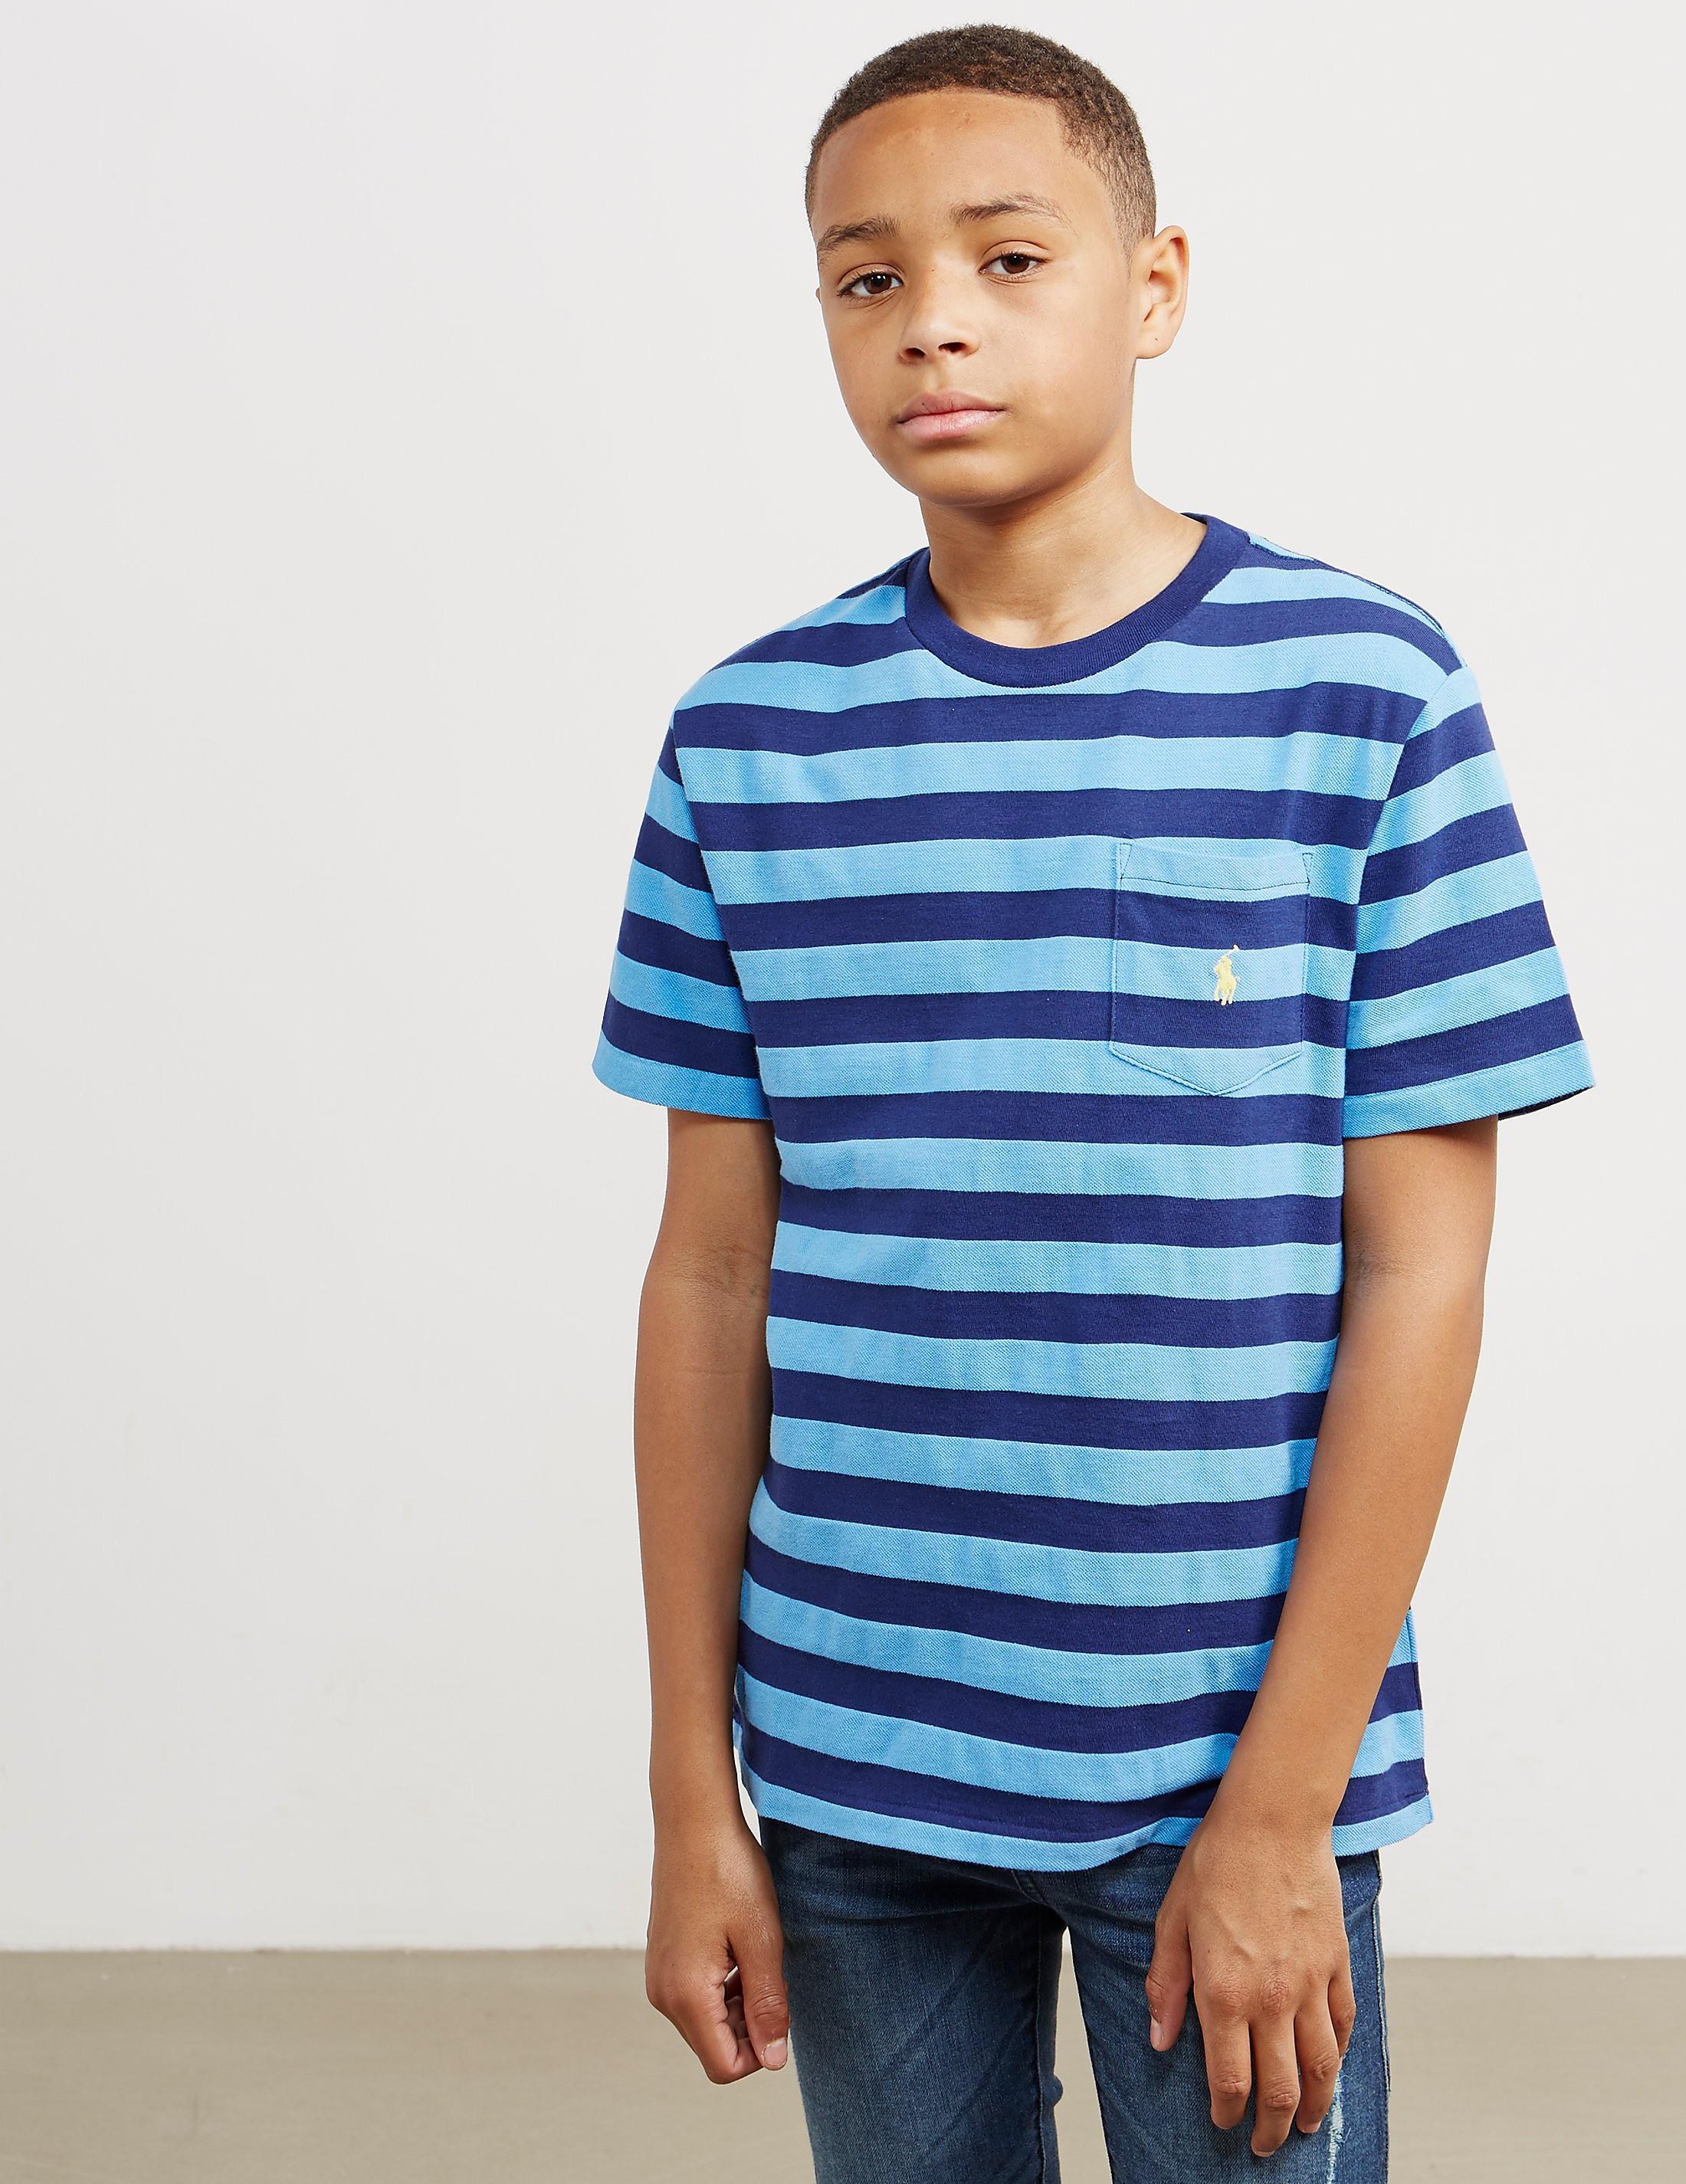 Polo Ralph Lauren Pocket Stripe Short Sleeve T-Shirt